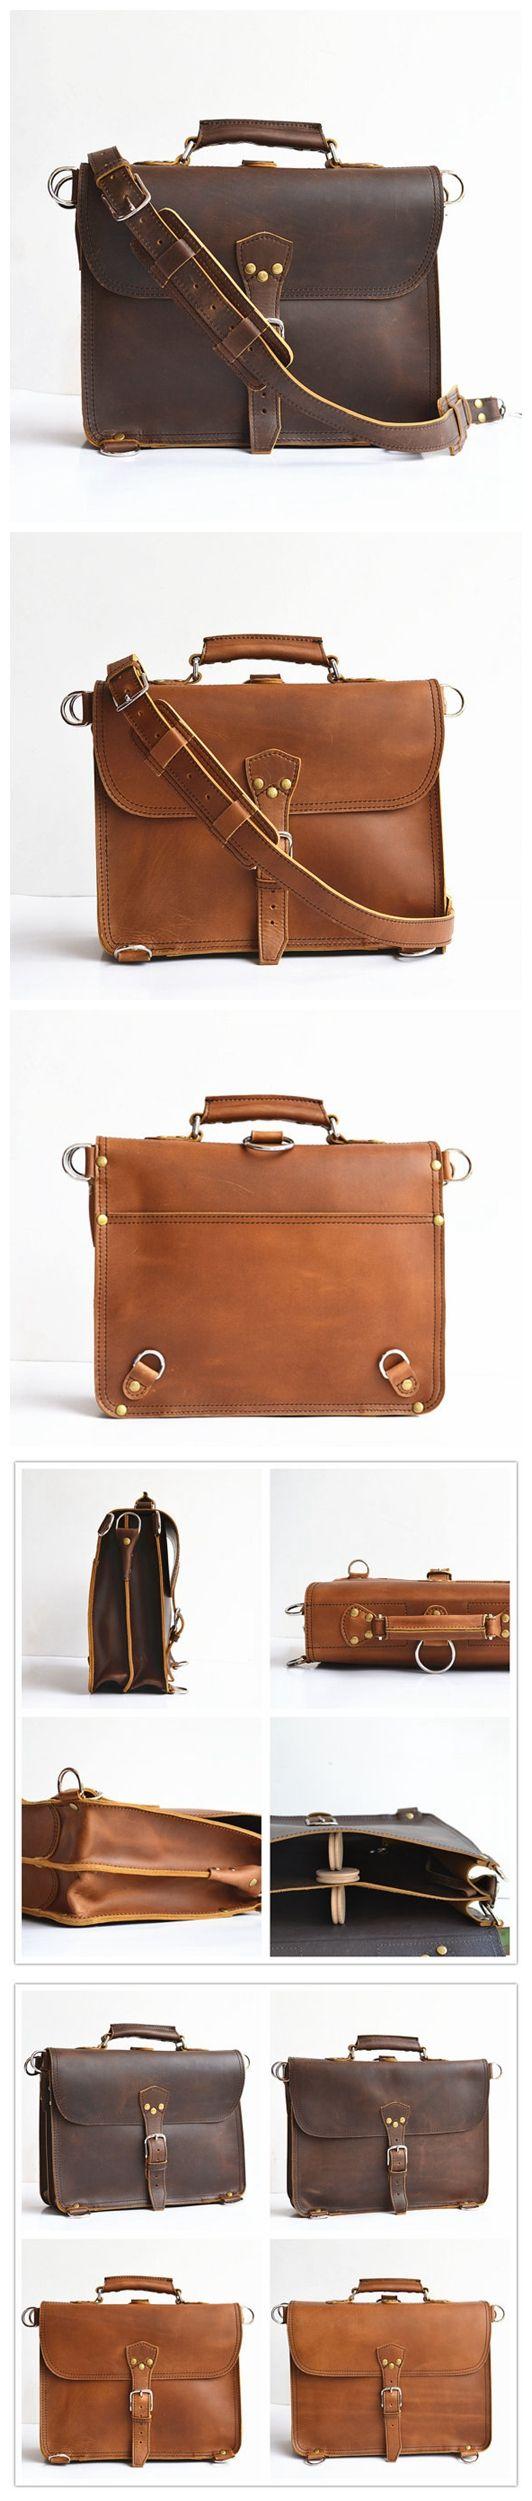 Handmade Mens Leather Briefcase Men Leather Backpack Thin Leather Bag for Men Leather Messenger Bag Leather Satchel Leather MacBook Bag